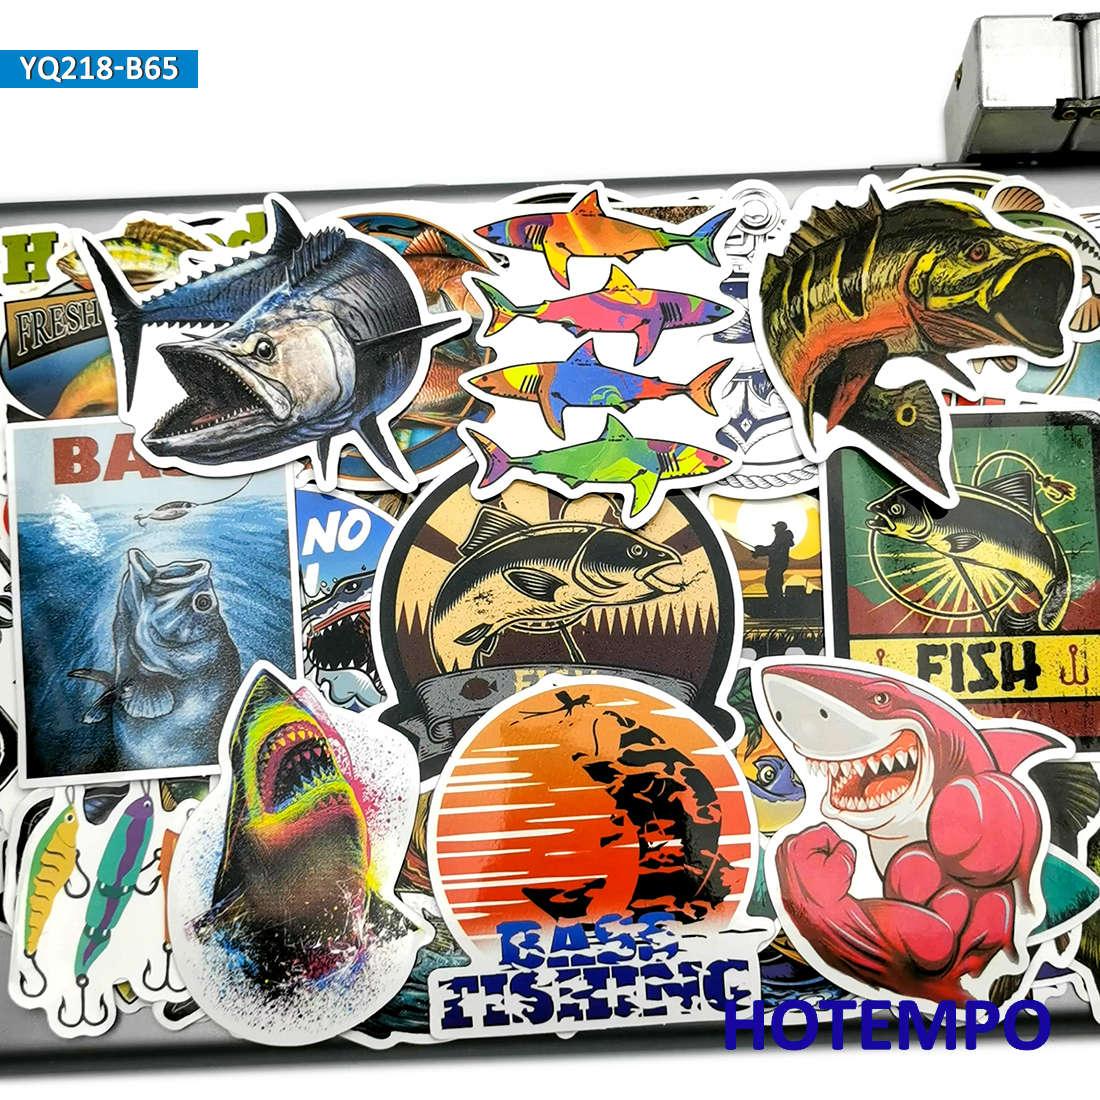 AliExpress - 65pcs Outdoors Fisherman Go Fishing Fashion Fish Stickers for Mobile Phone Laptop Luggage Skateboard Box Tank Bucket Art Sticker